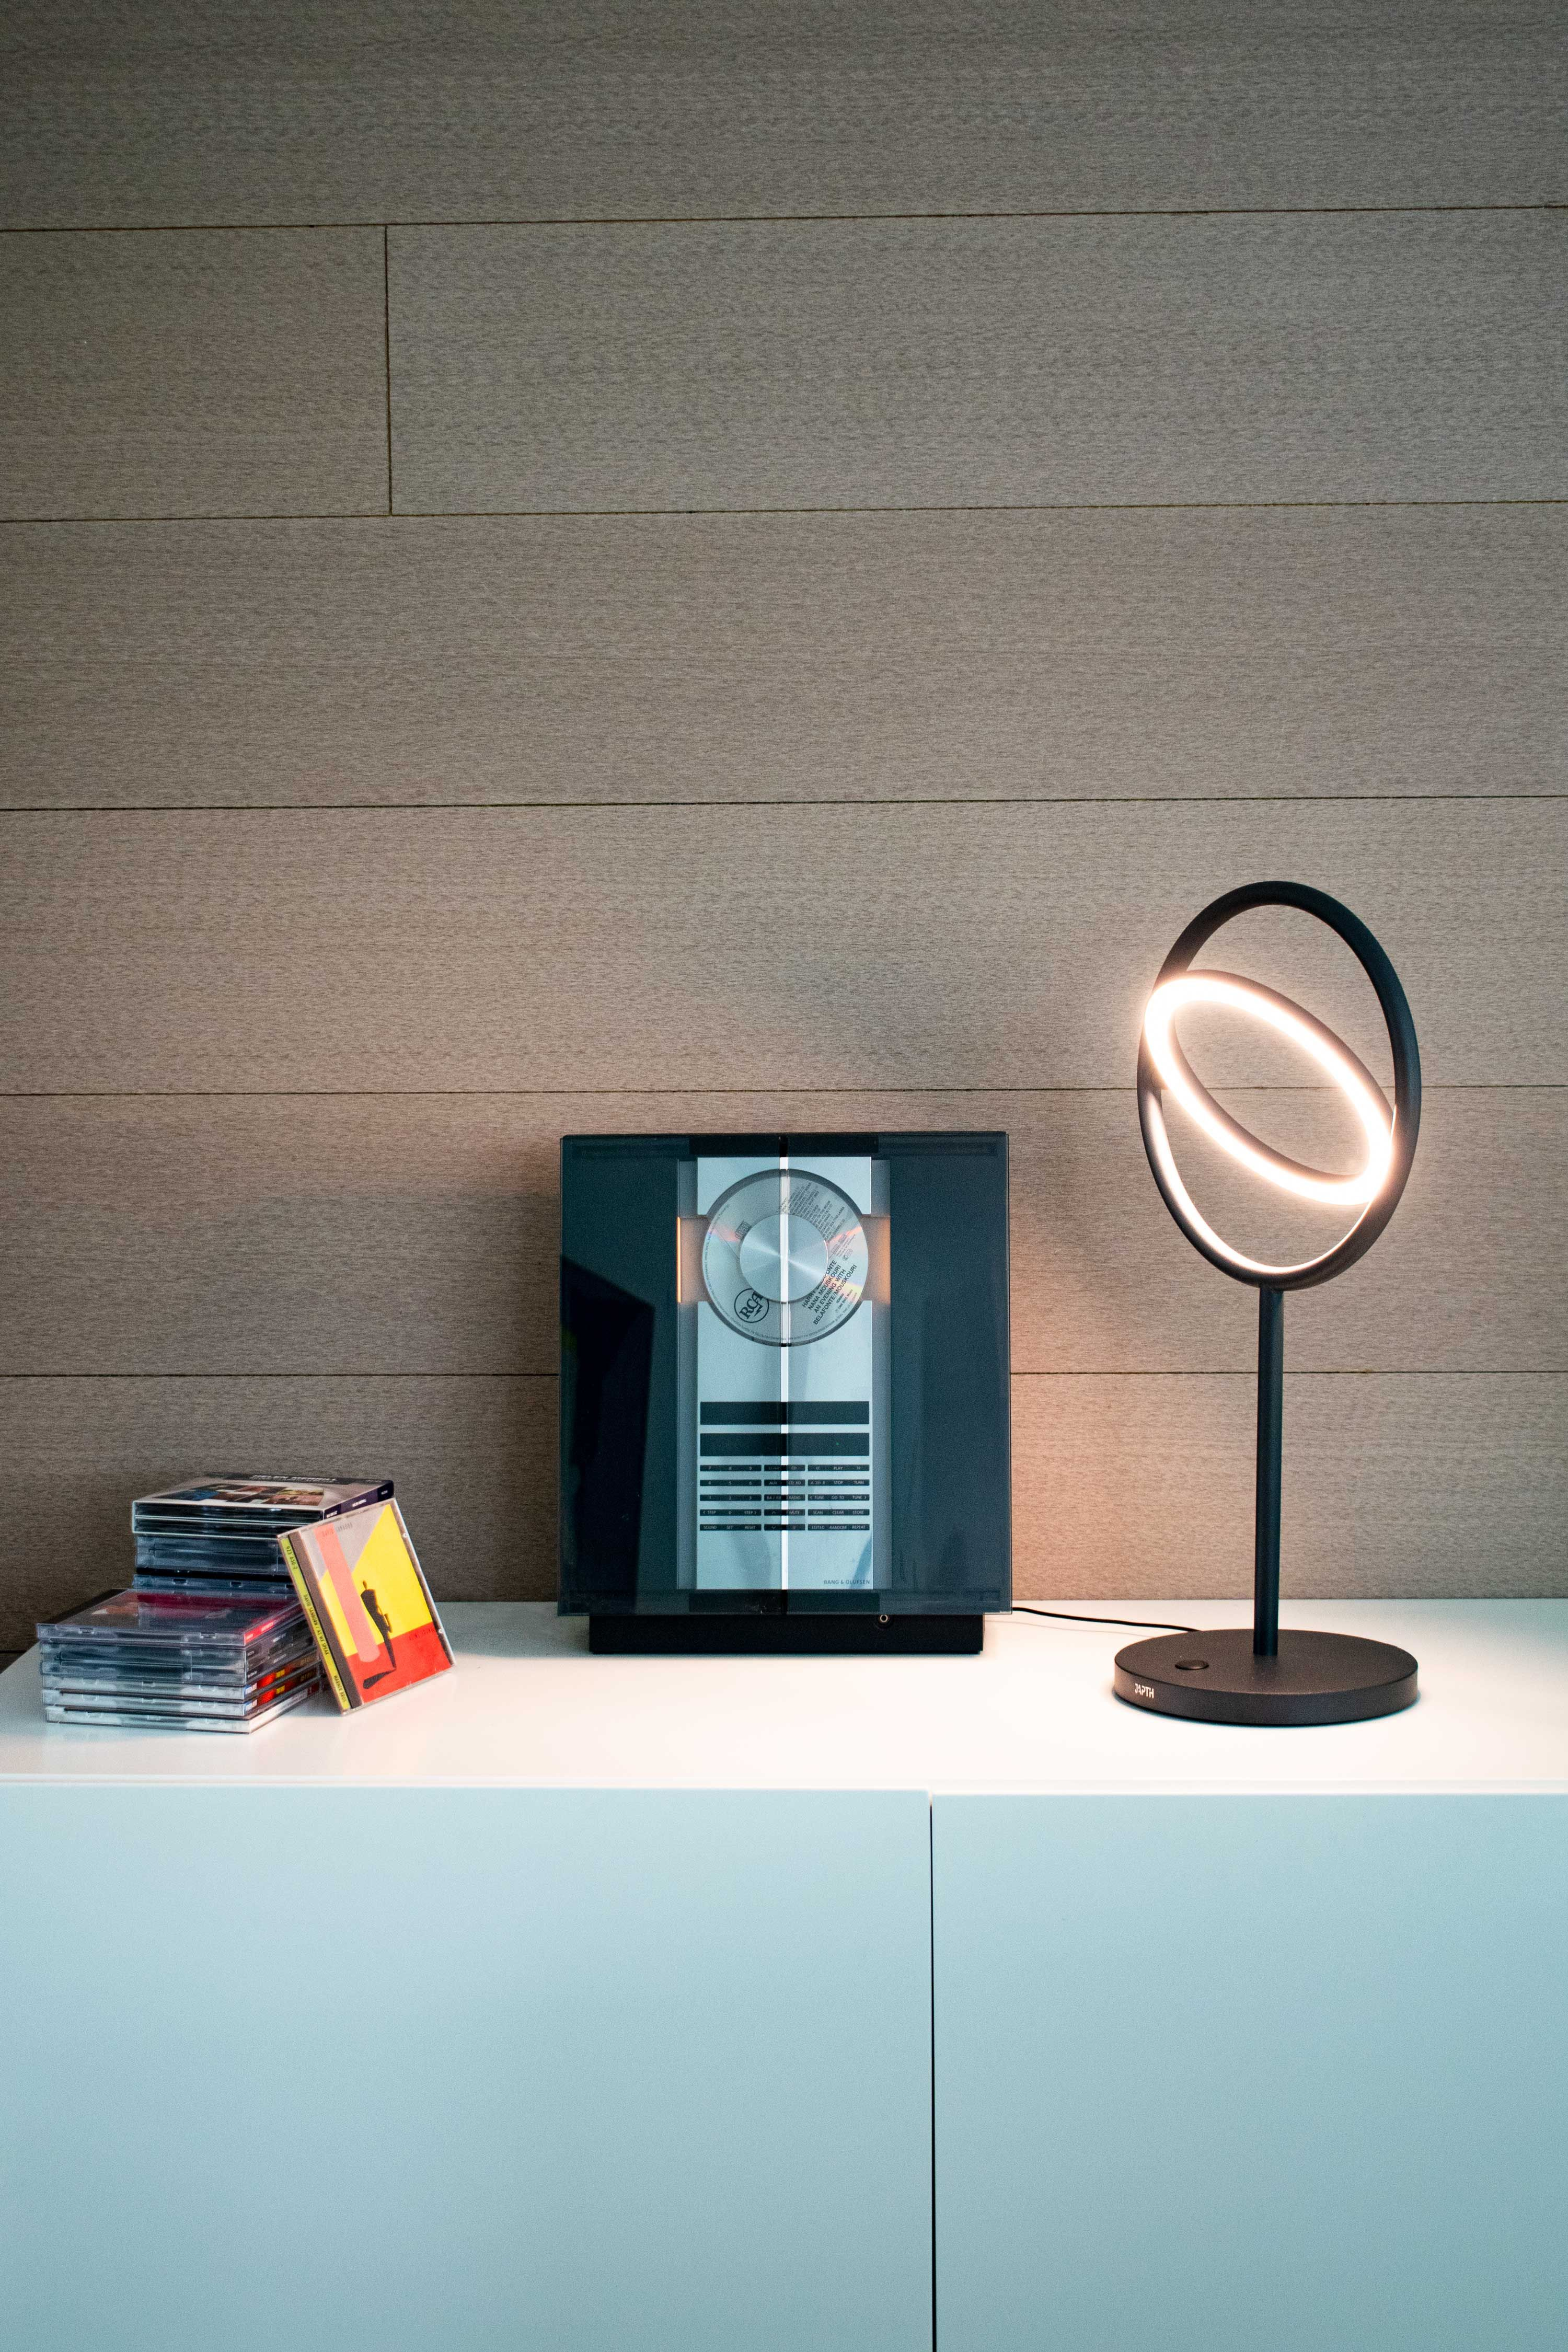 Japth Echo In 2020 Floor Lamp Mirror Table Table Lamp